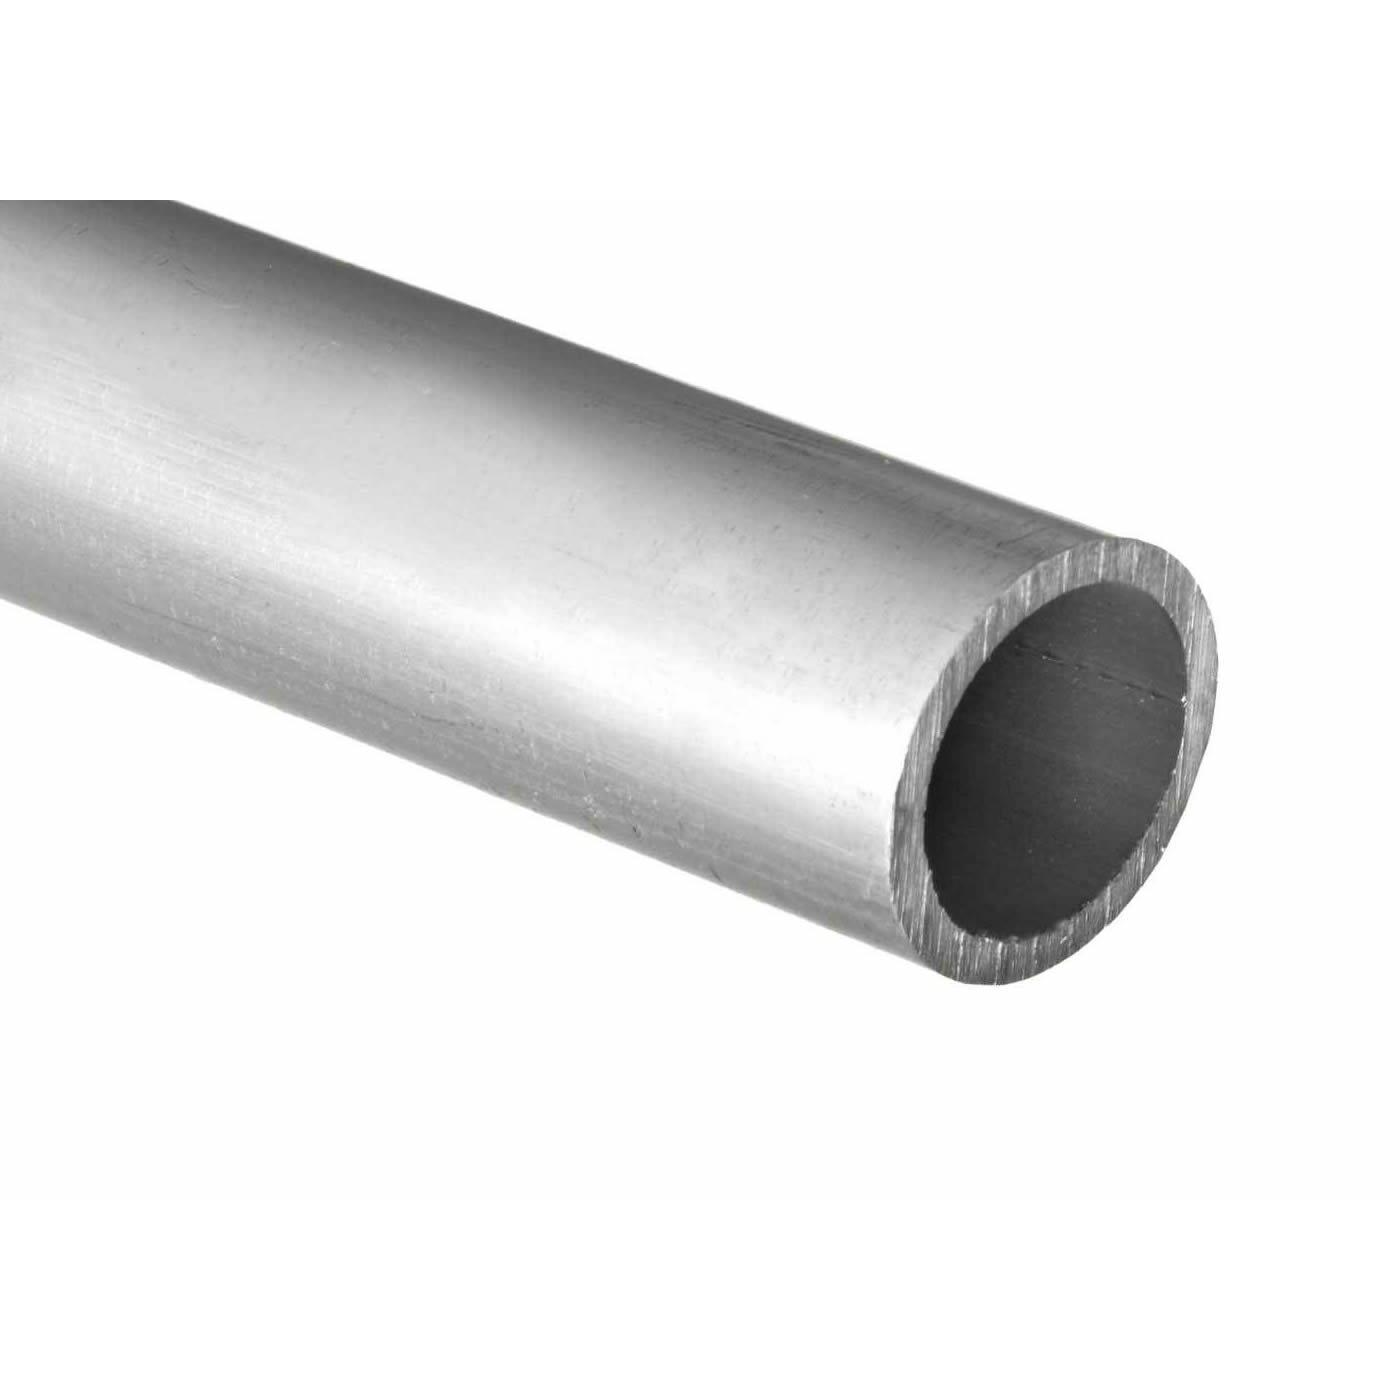 RMP 6061-T6 Aluminum Pipe, 1 1/2'', 72'' Length, Schedule 40 ASTM B429 Structural